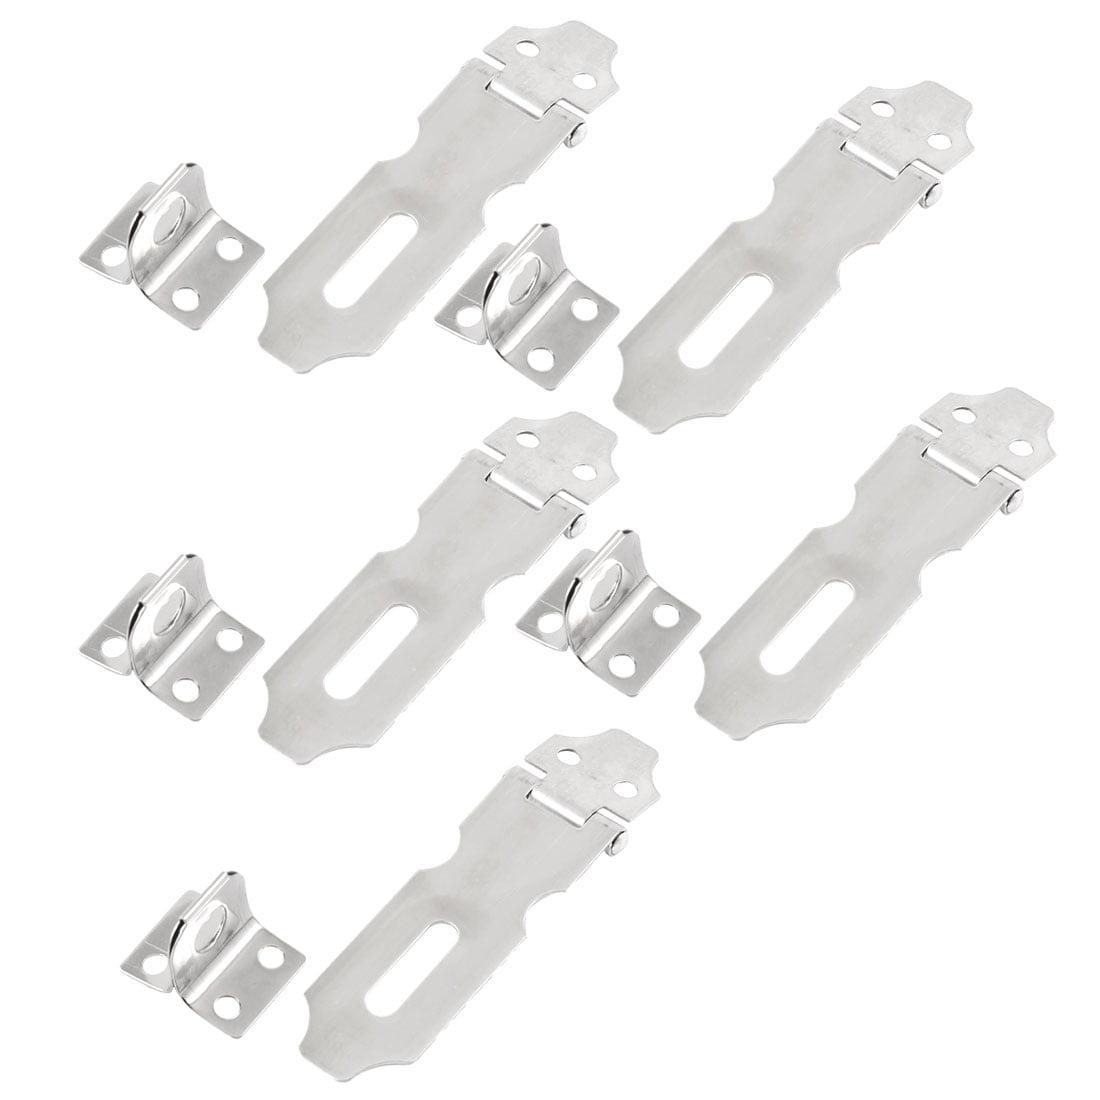 "Unique Bargains 5 Set Silver Tone Metal Hasp Staple Lock Set 2.8"" Long for Cupboard Cabinet"